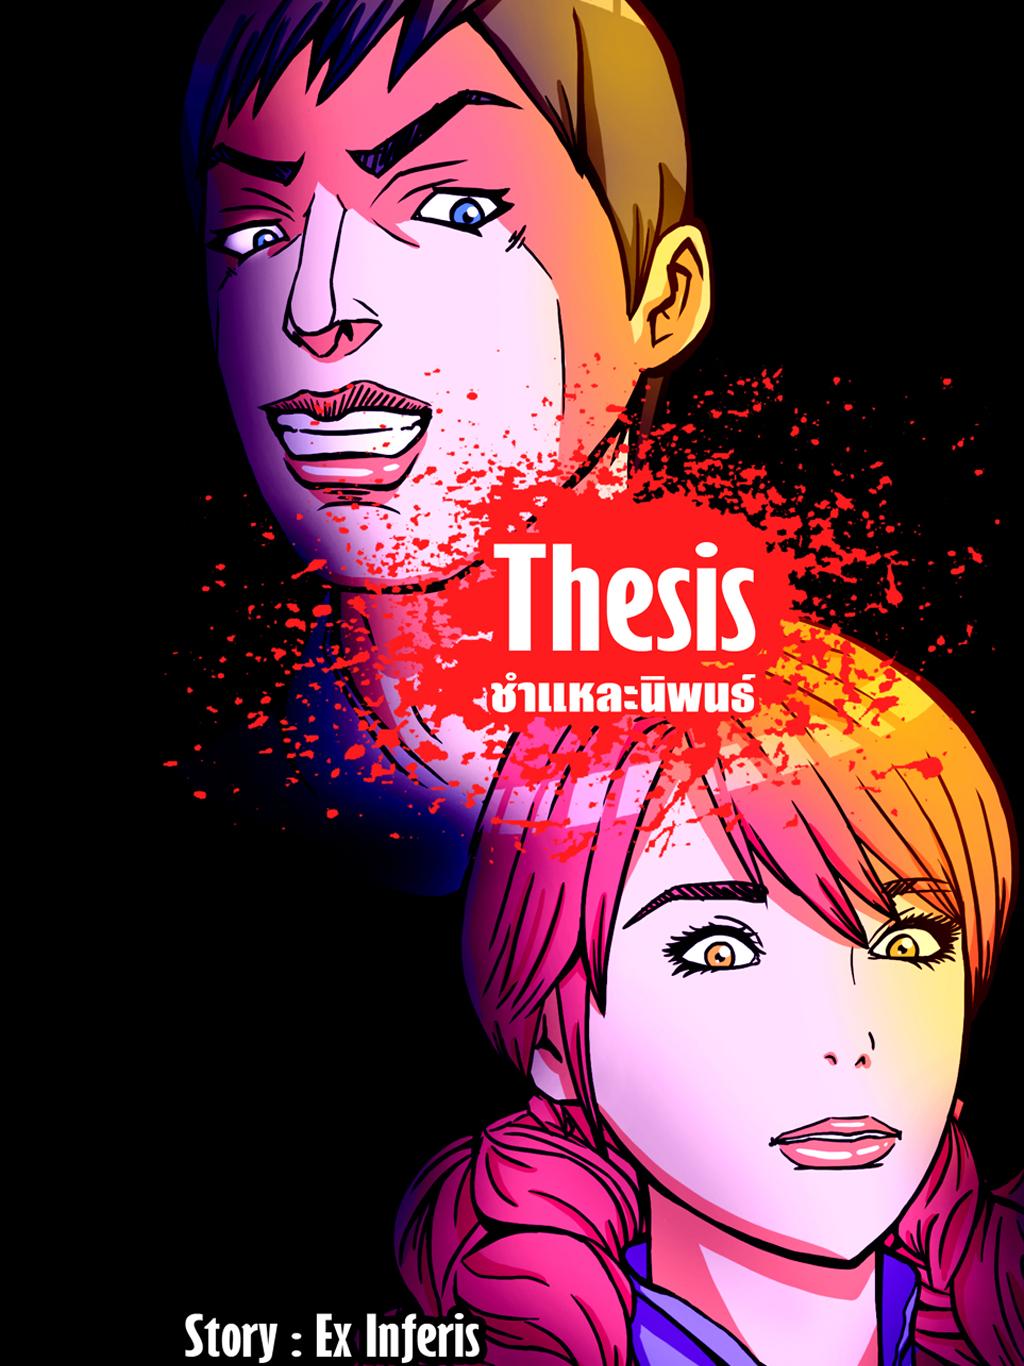 Thesis ชำแหละนิพนธ์